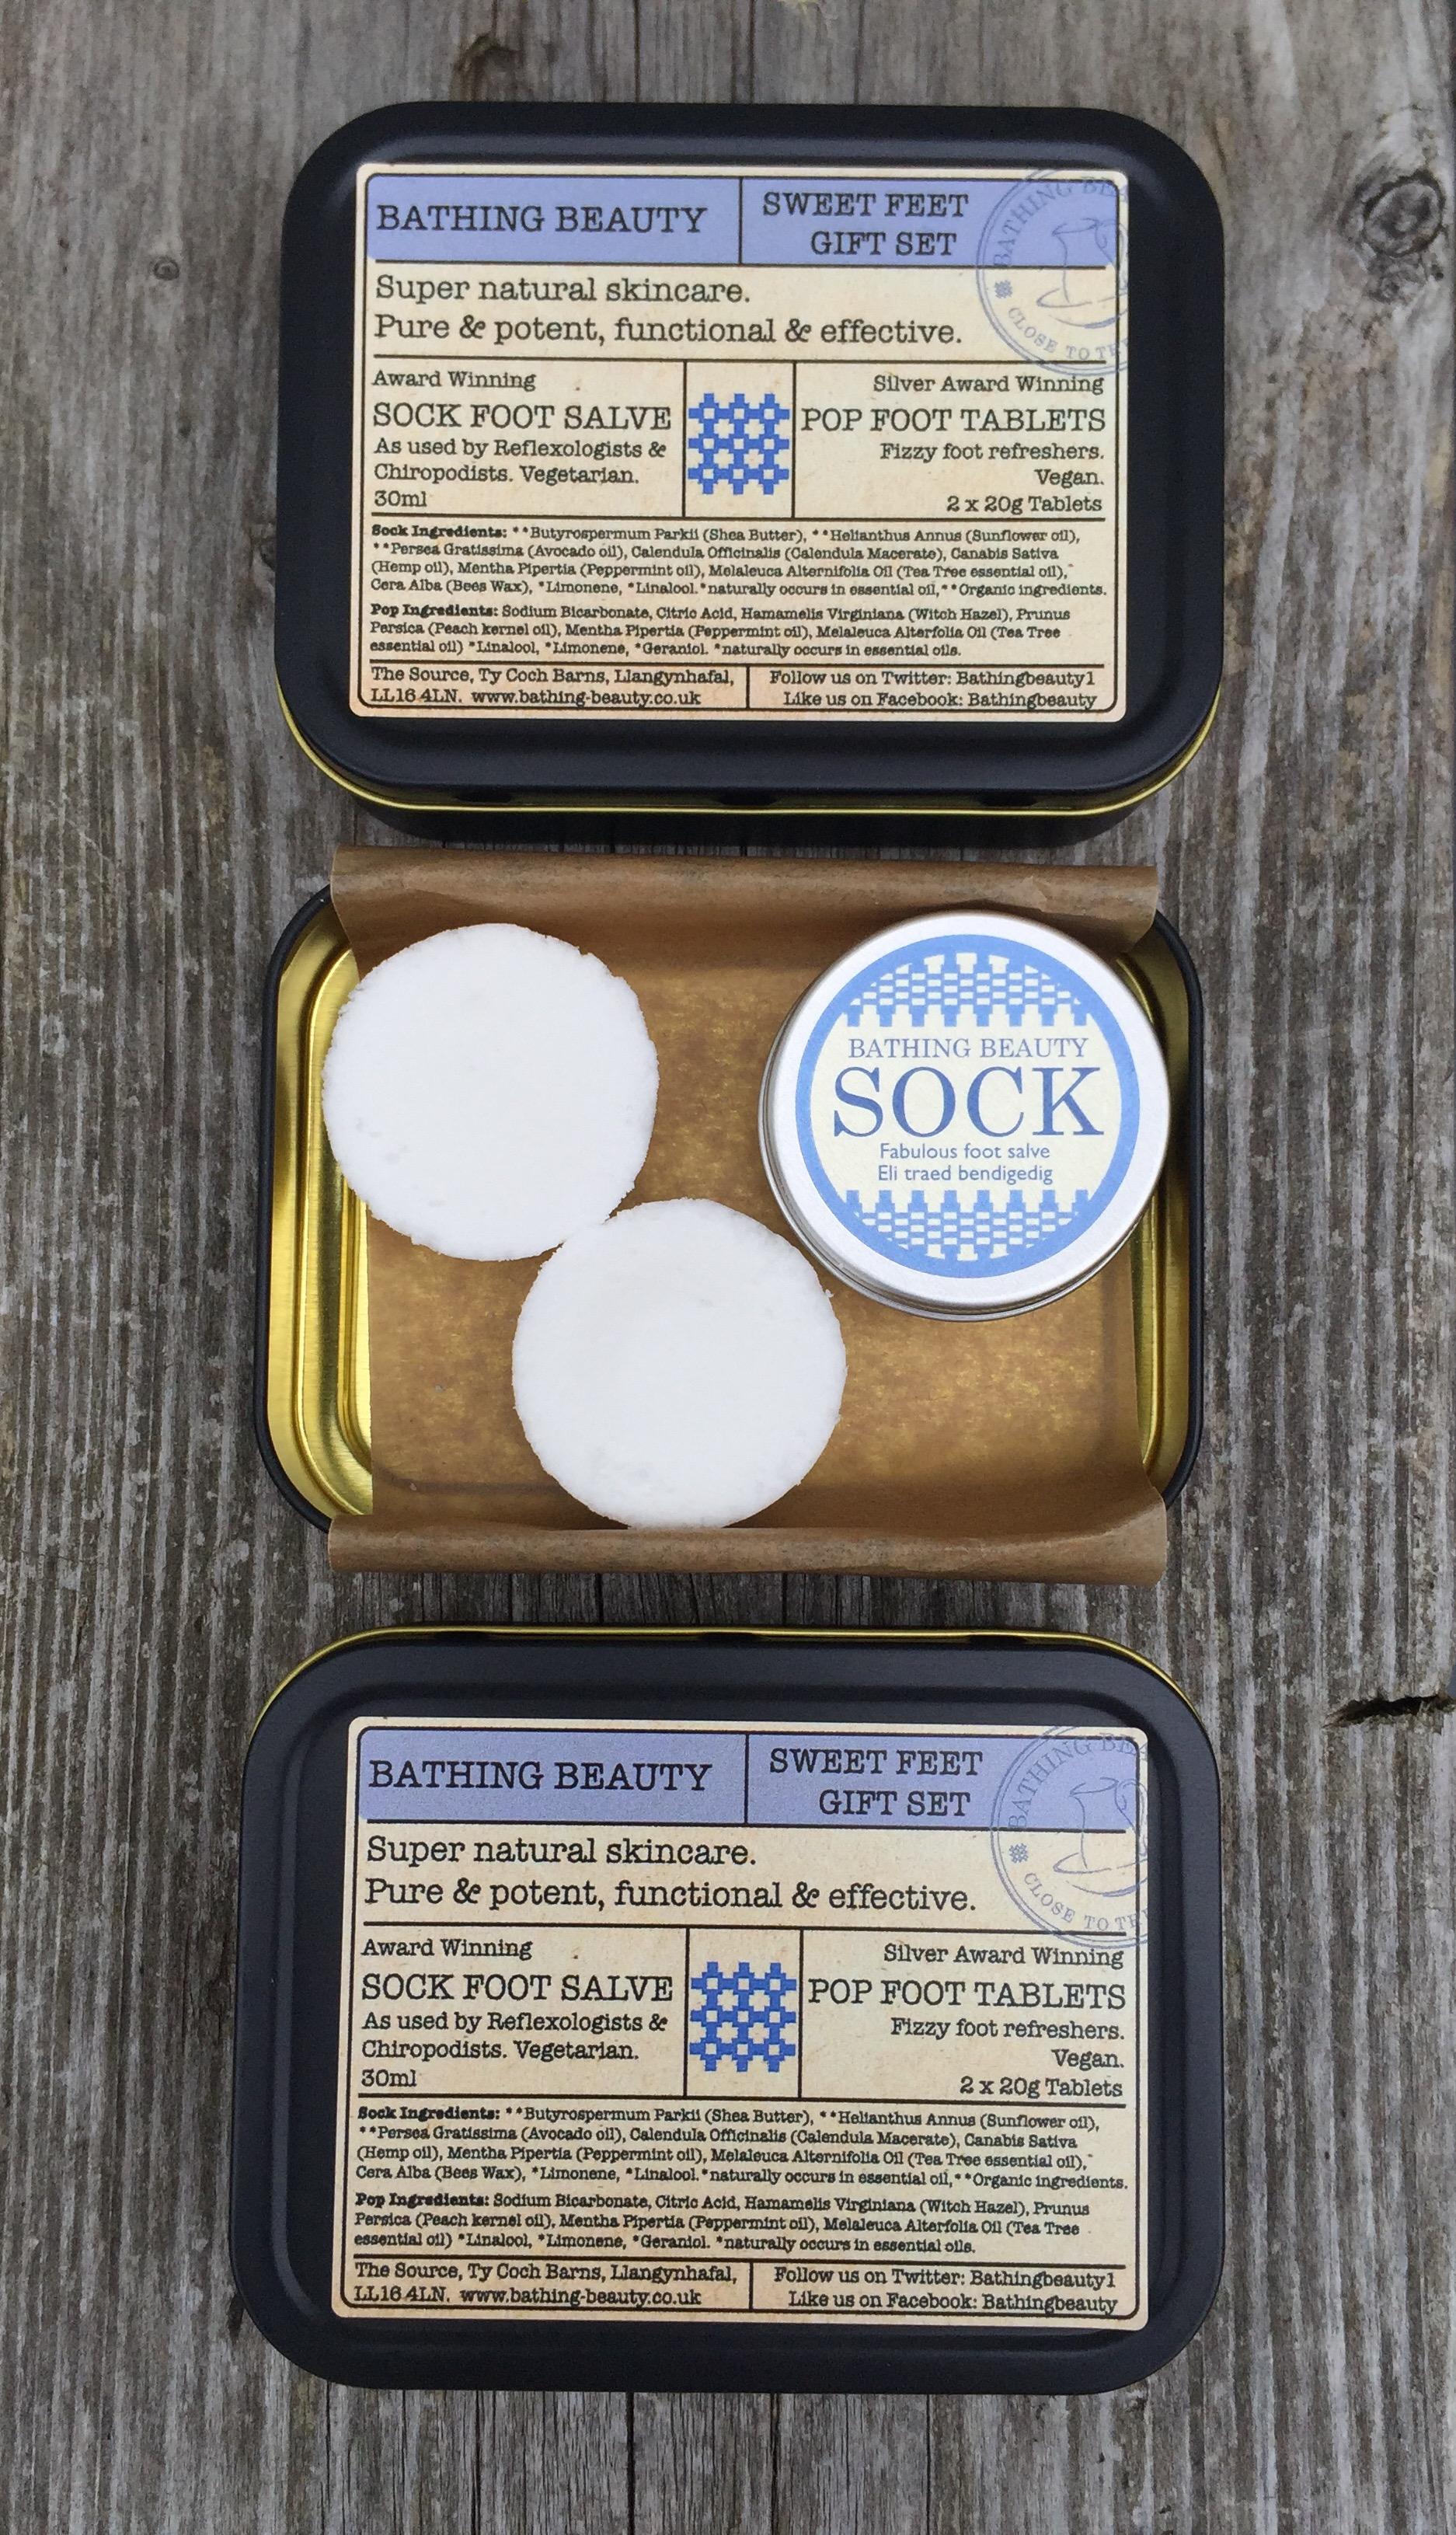 Swtt Feet Gift Tin contains silver award winning Pop Foot Tablet and award winning Sock foot salve